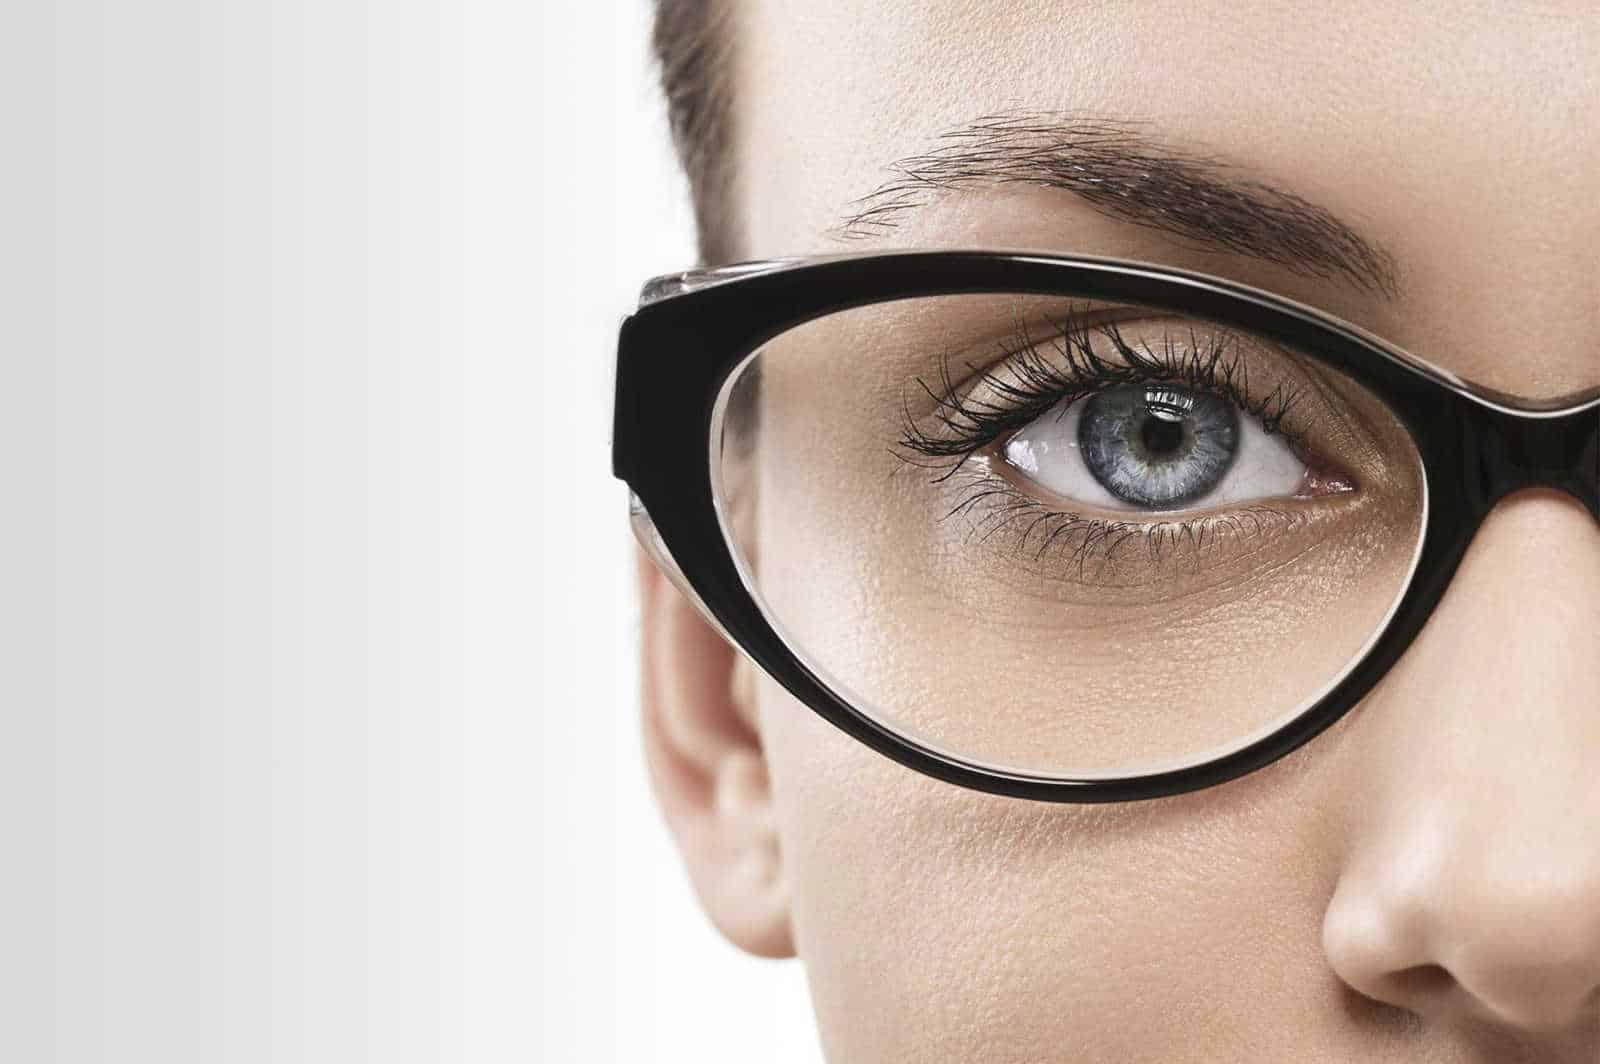 Программа обследования «Сохрани зрение»